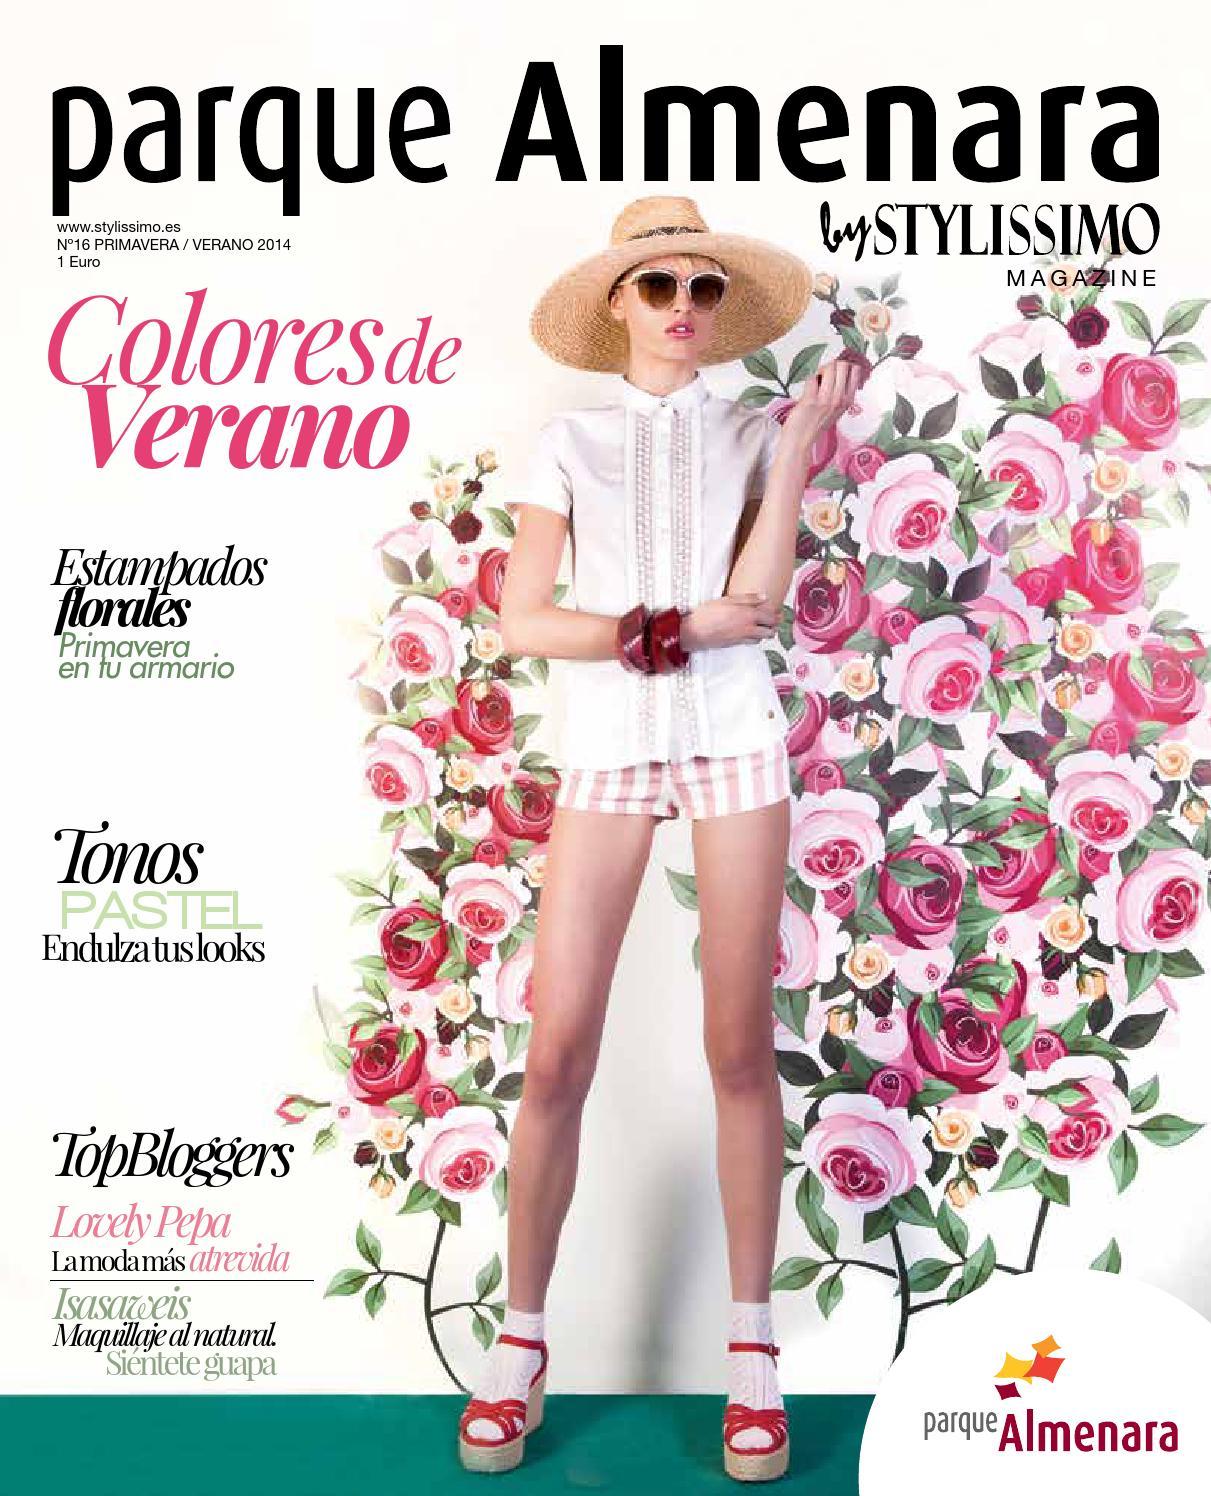 By Issuu Parque Almenara Magazine Sty16 Stylissimo CxsQBhdtro